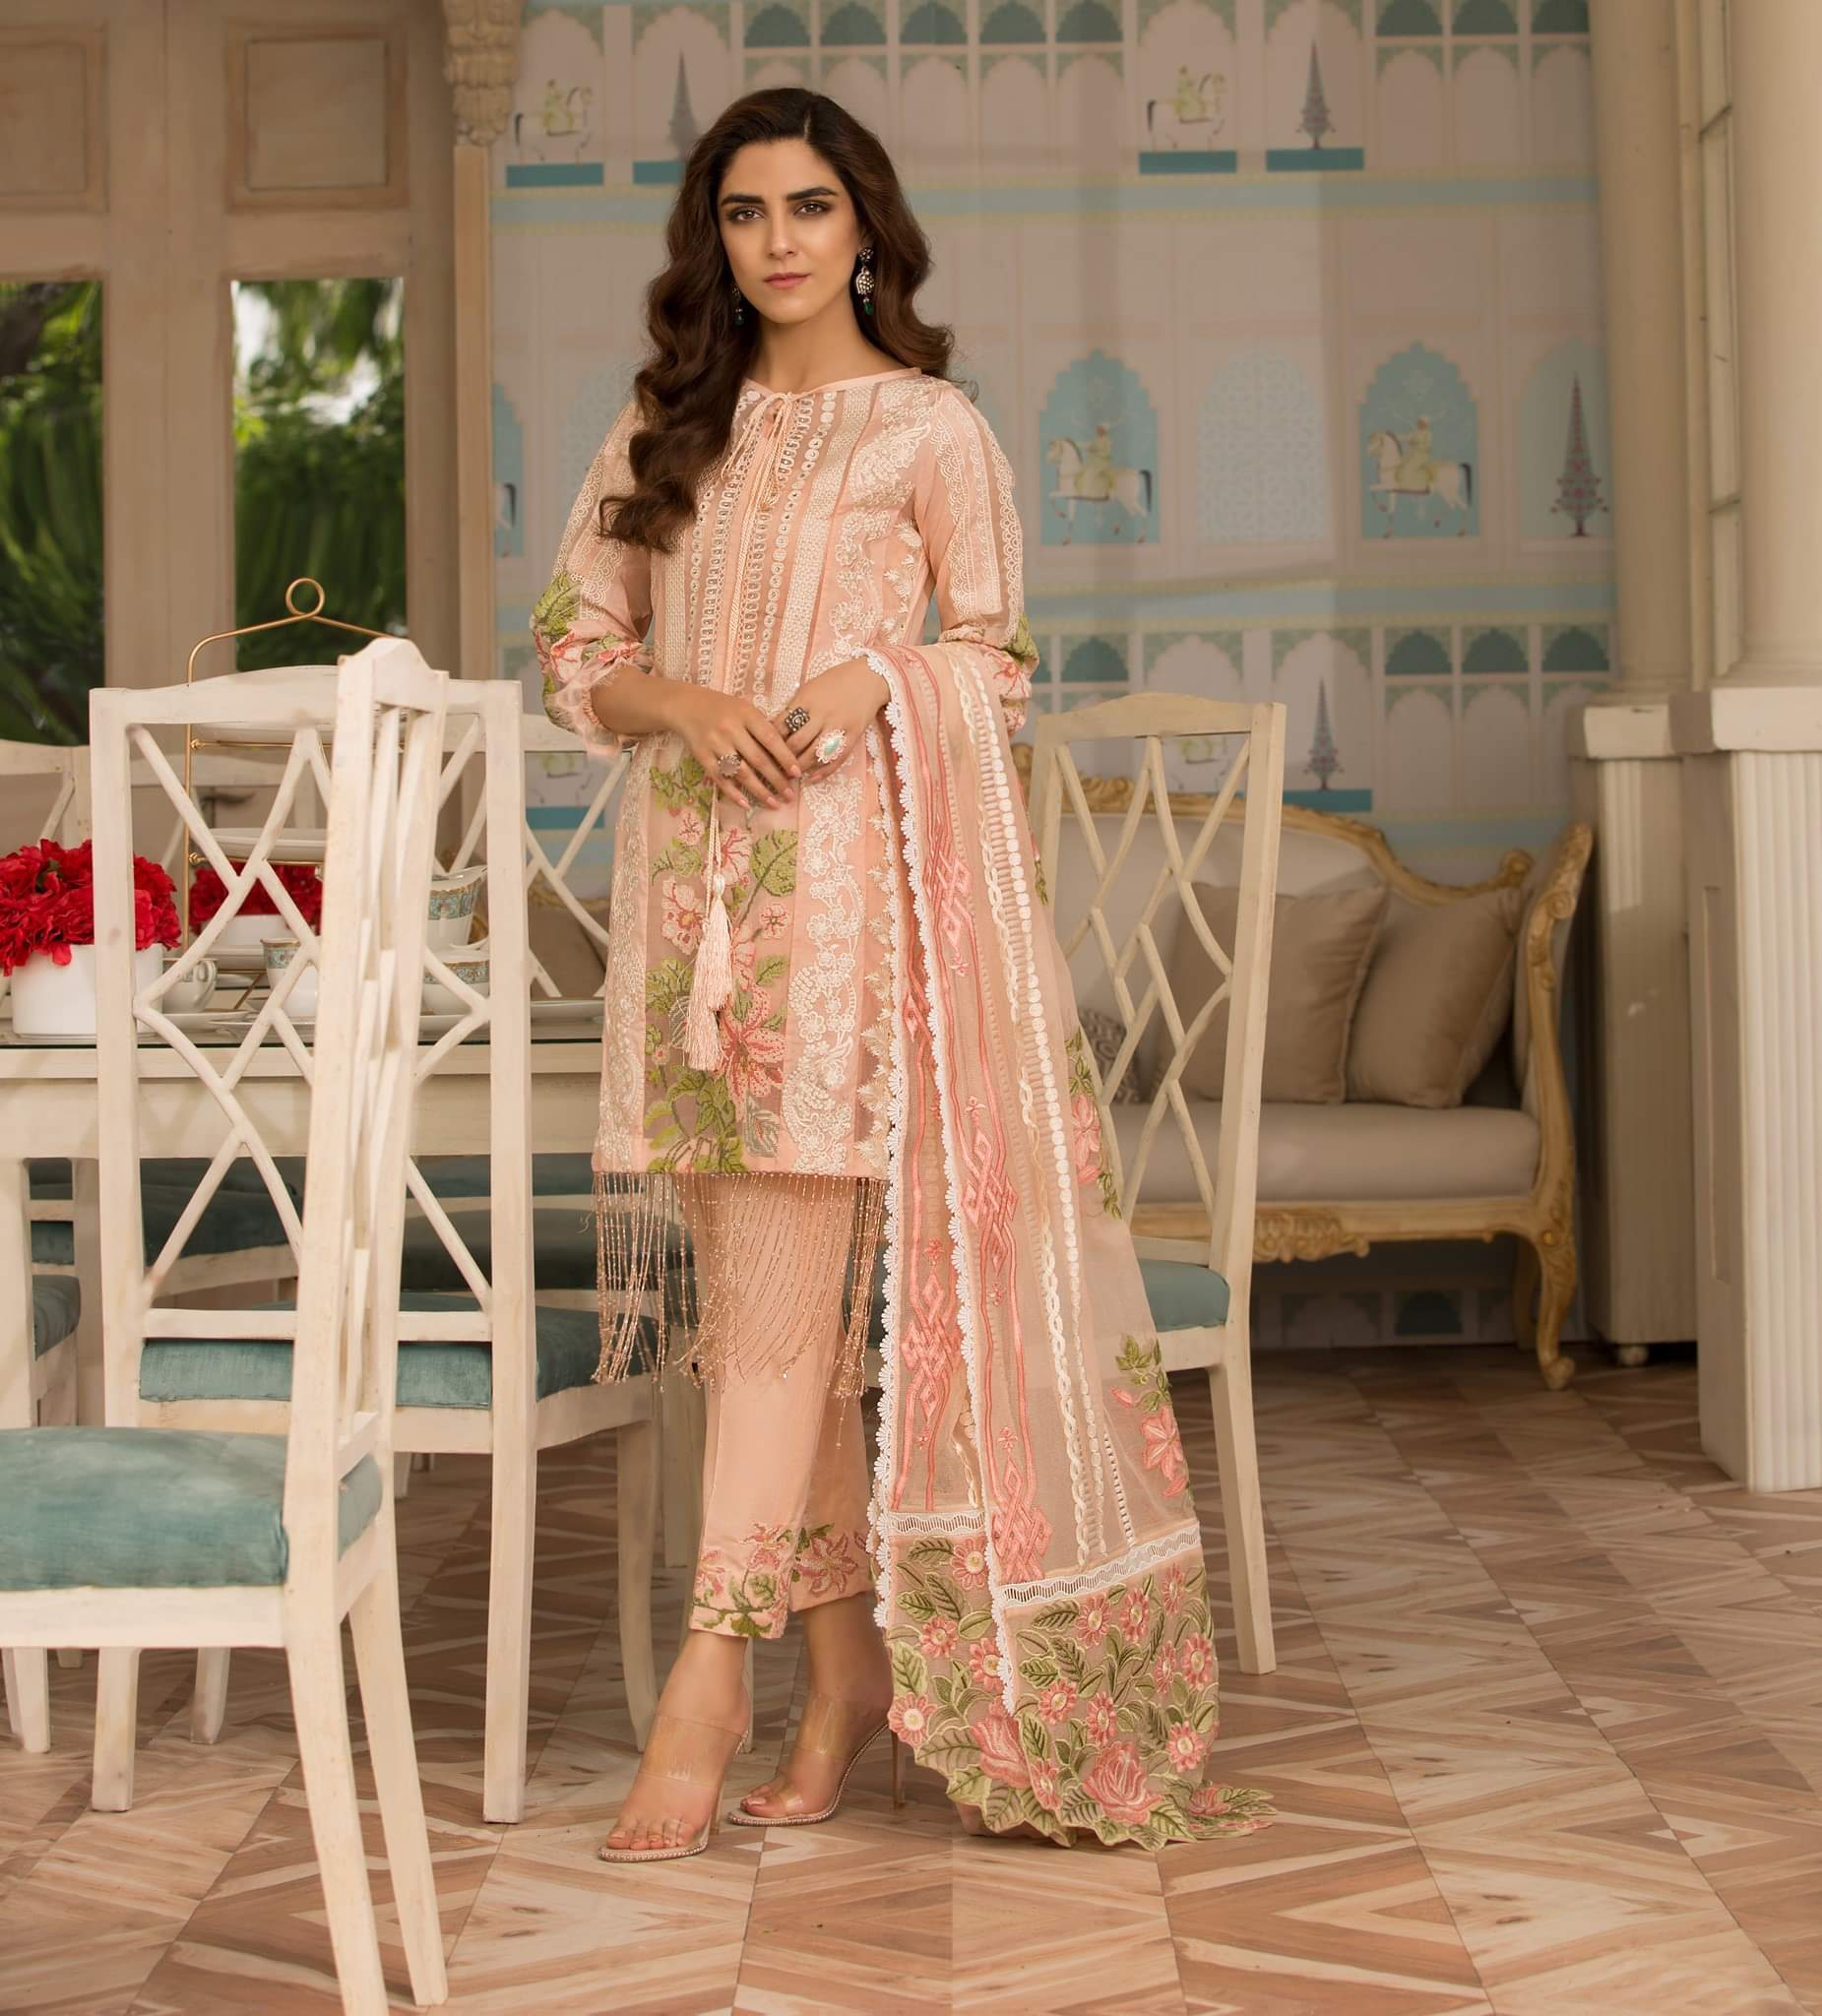 564790fd32 Crimson Luxury Festive Eid 2019 | Saira Shakira Lawn Collection Shop ...